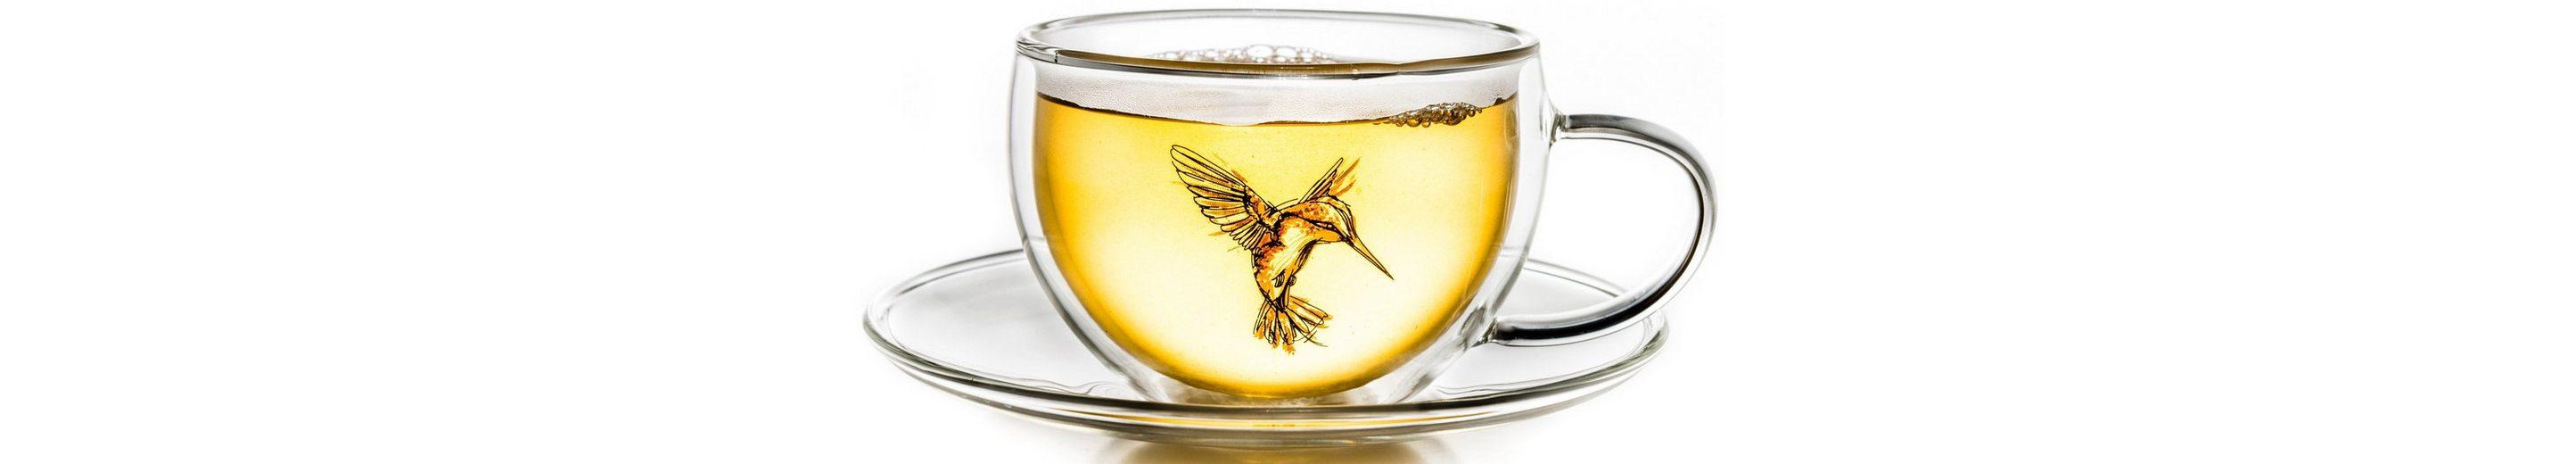 Creano Thermo-Tasse, rot, doppelwandige Tee-Tasse, Latte Macchiato Tasse, »Hummi«